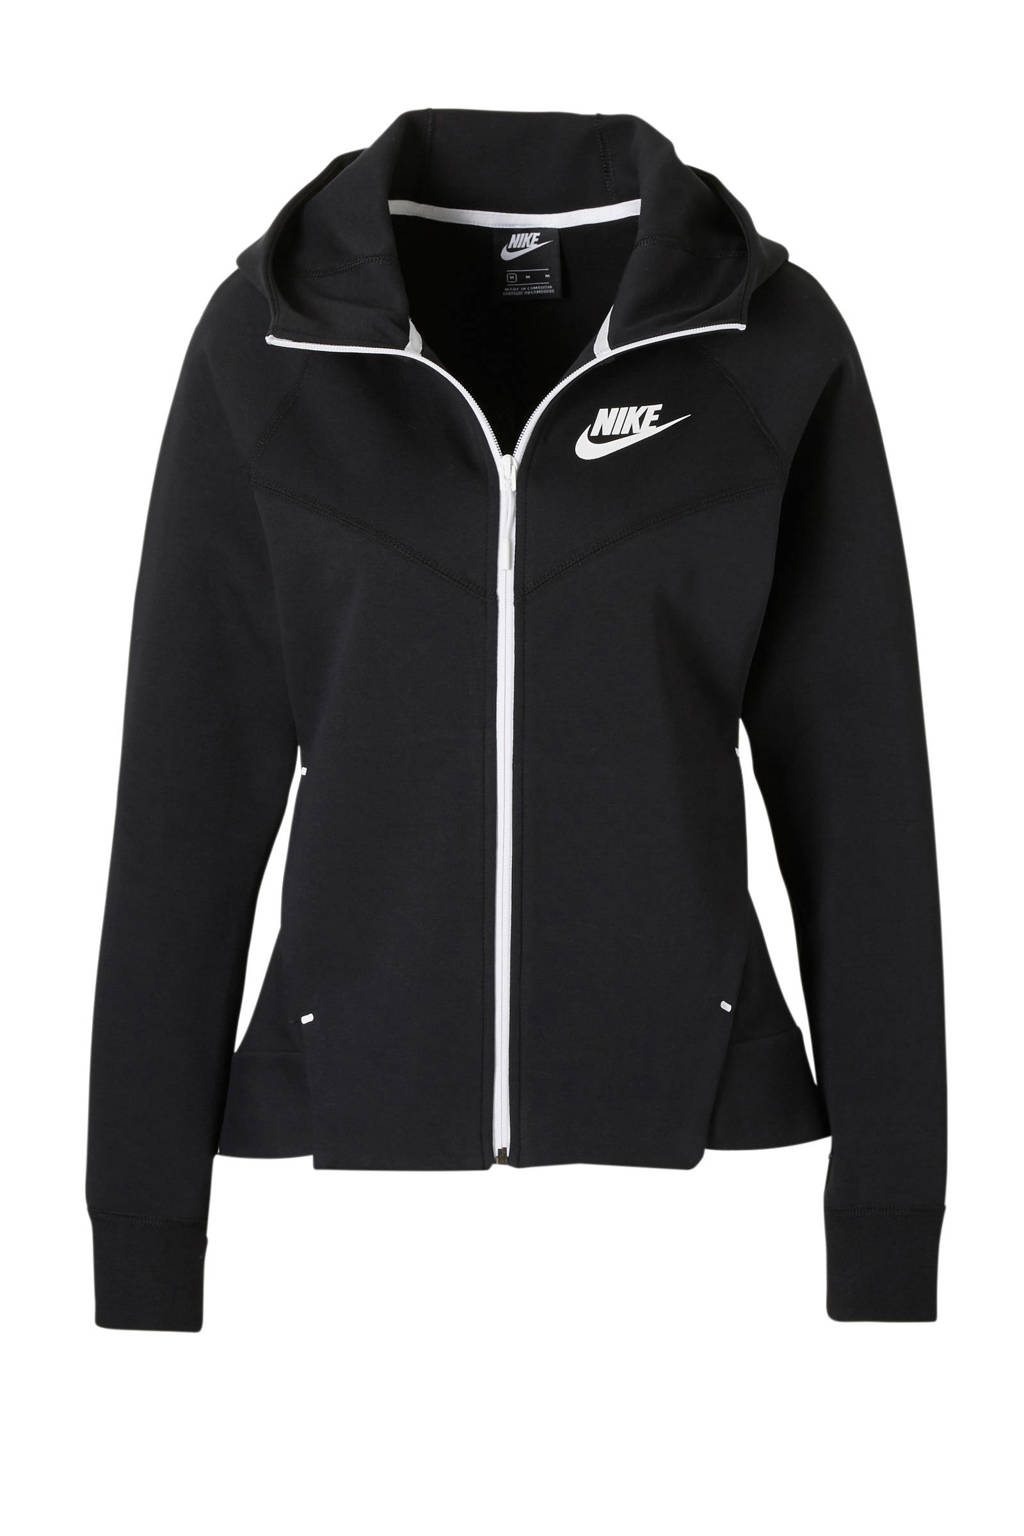 Nike sweatvest zwart, Zwart/wit